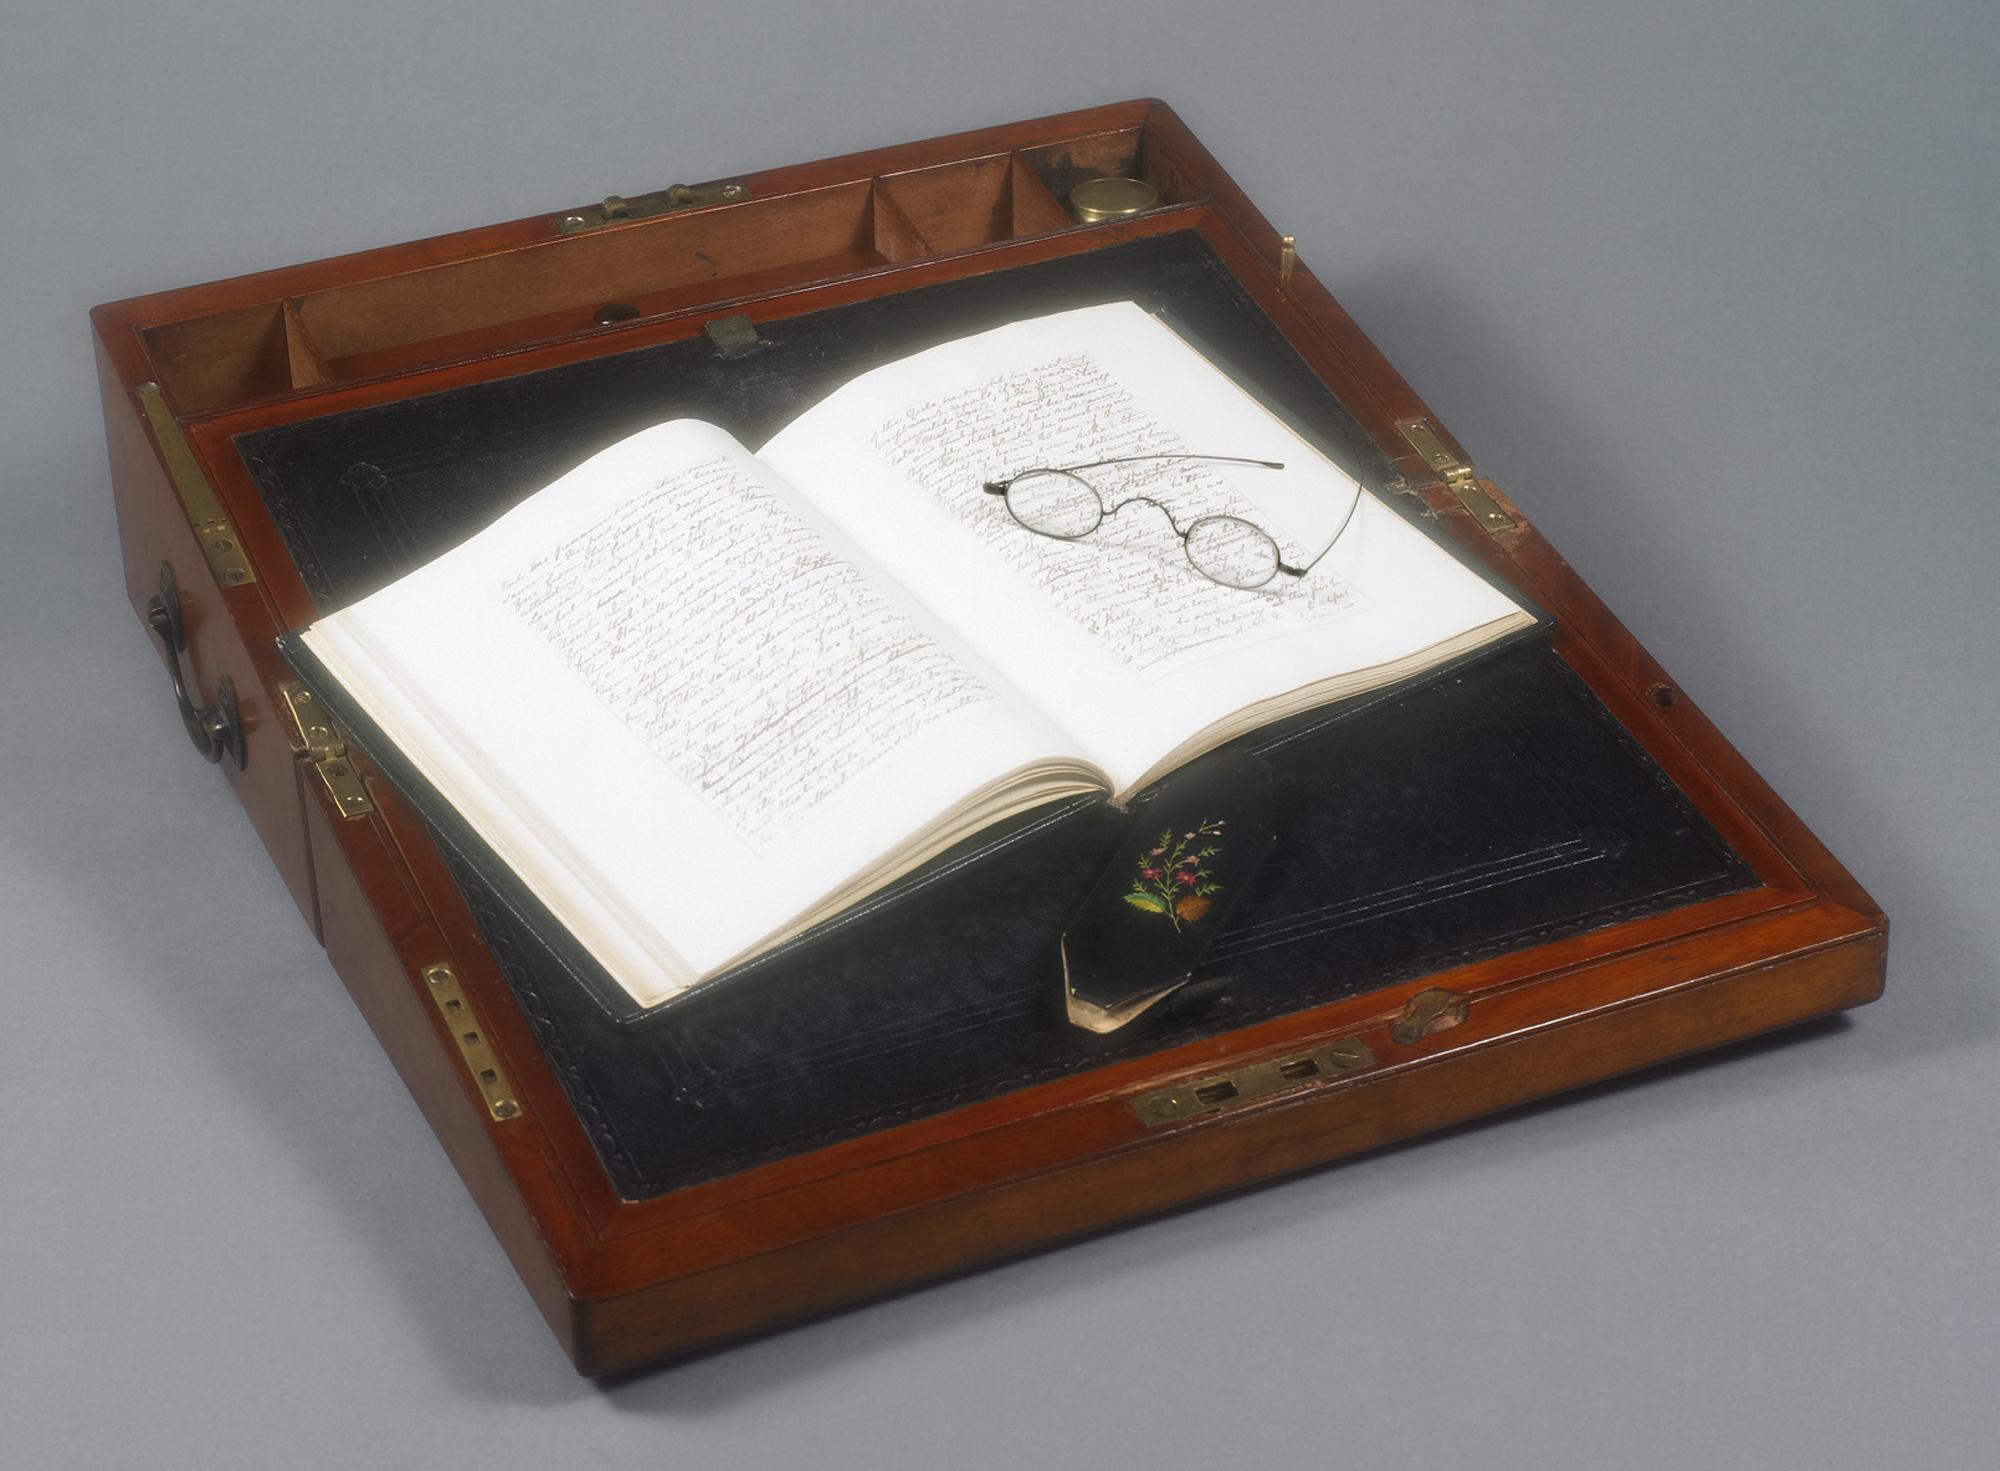 Jane Austen's writing desk (British Library)